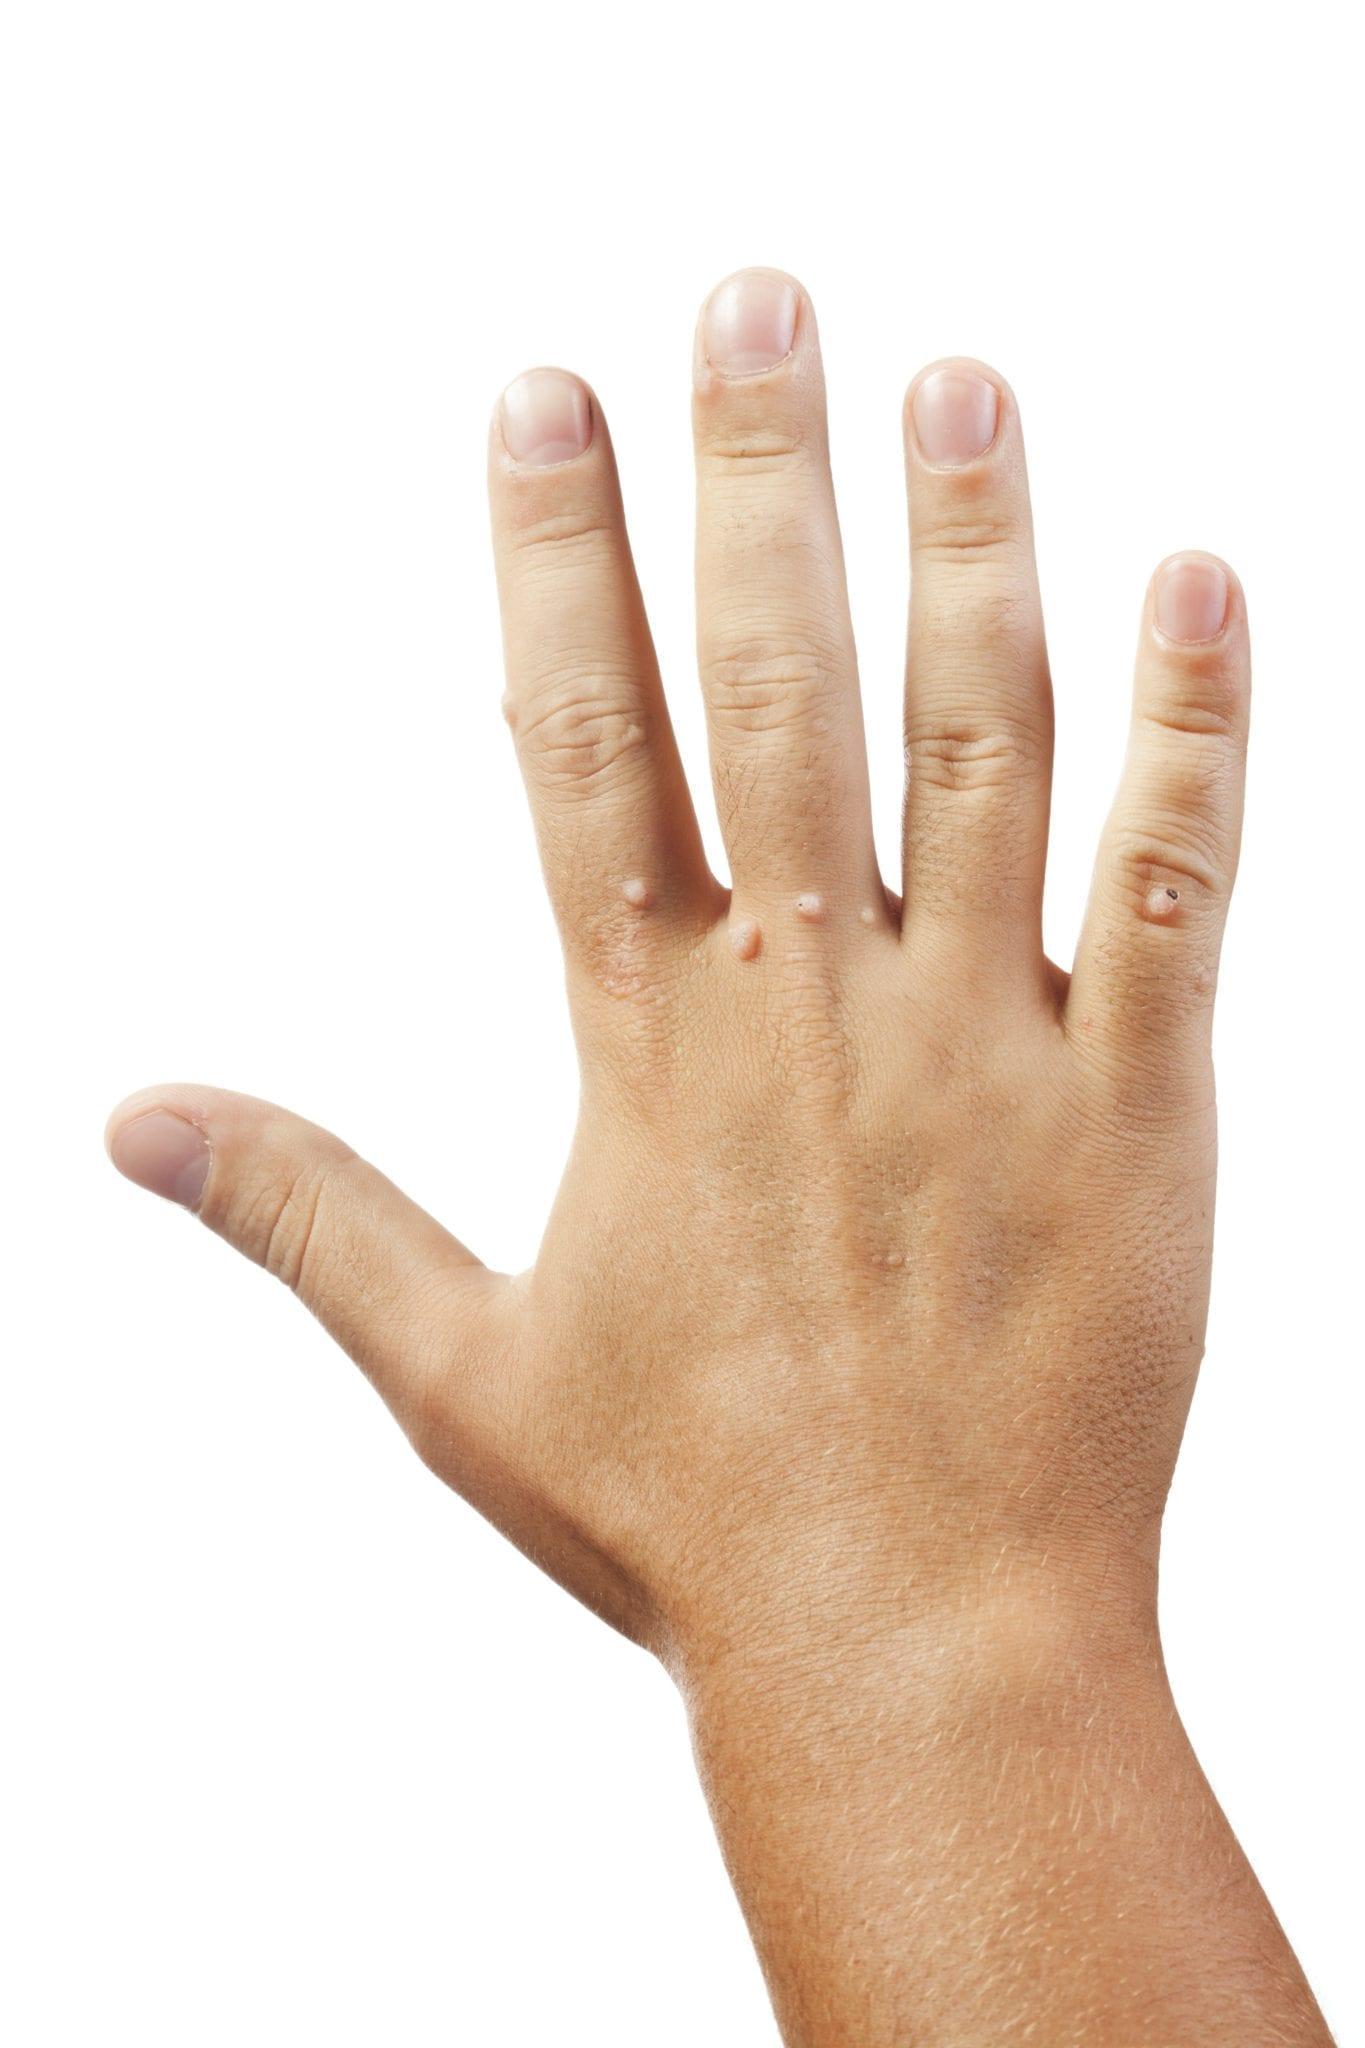 ce alimente detox colonul tău hpv anogenital infection icd 10